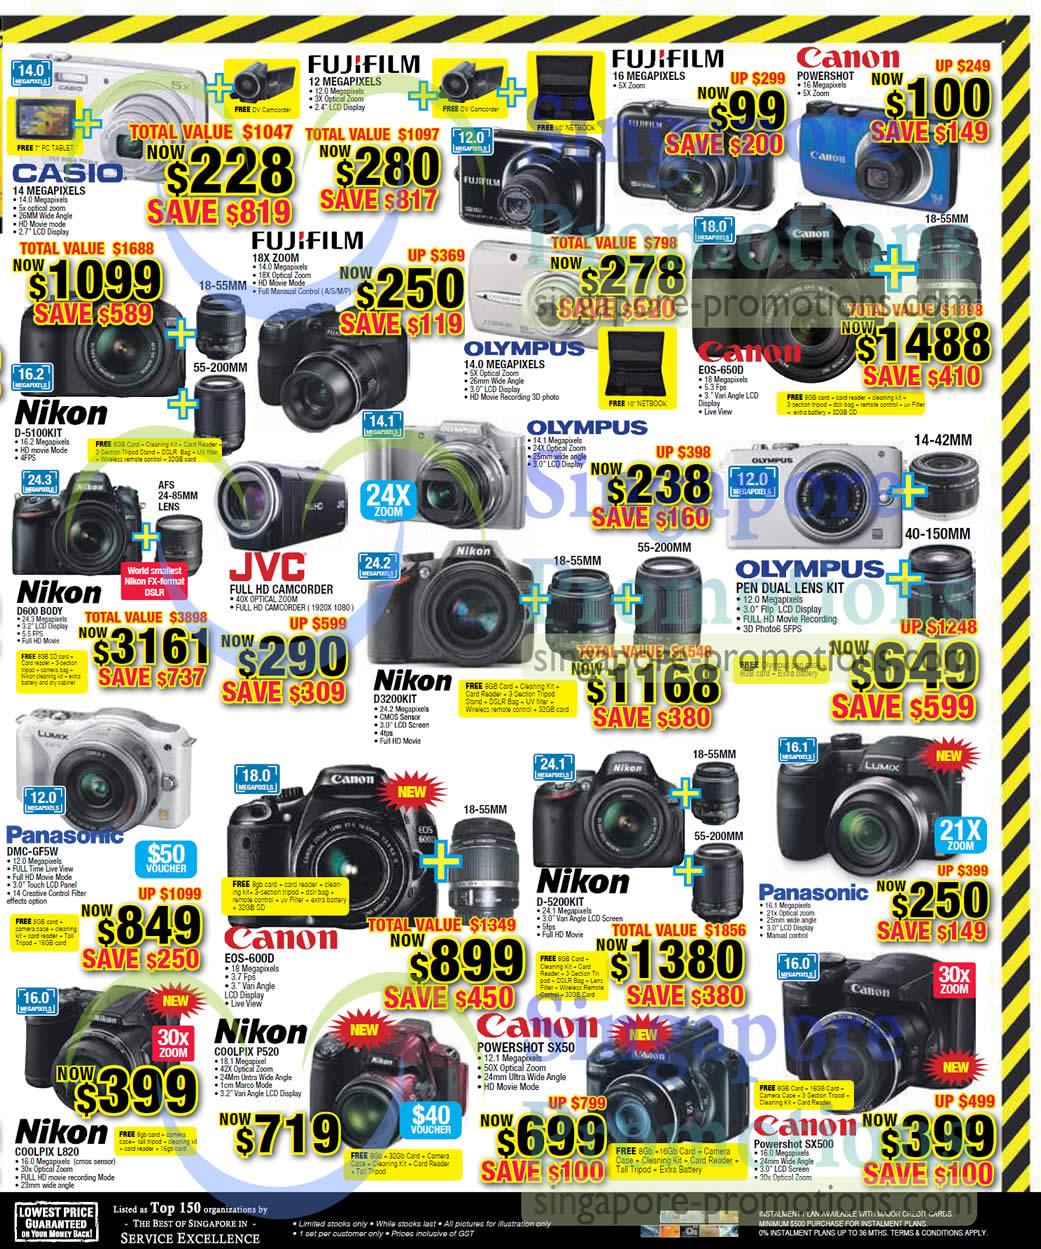 Digital Cameras Casio Fujifilm Canon Olympus Nikon